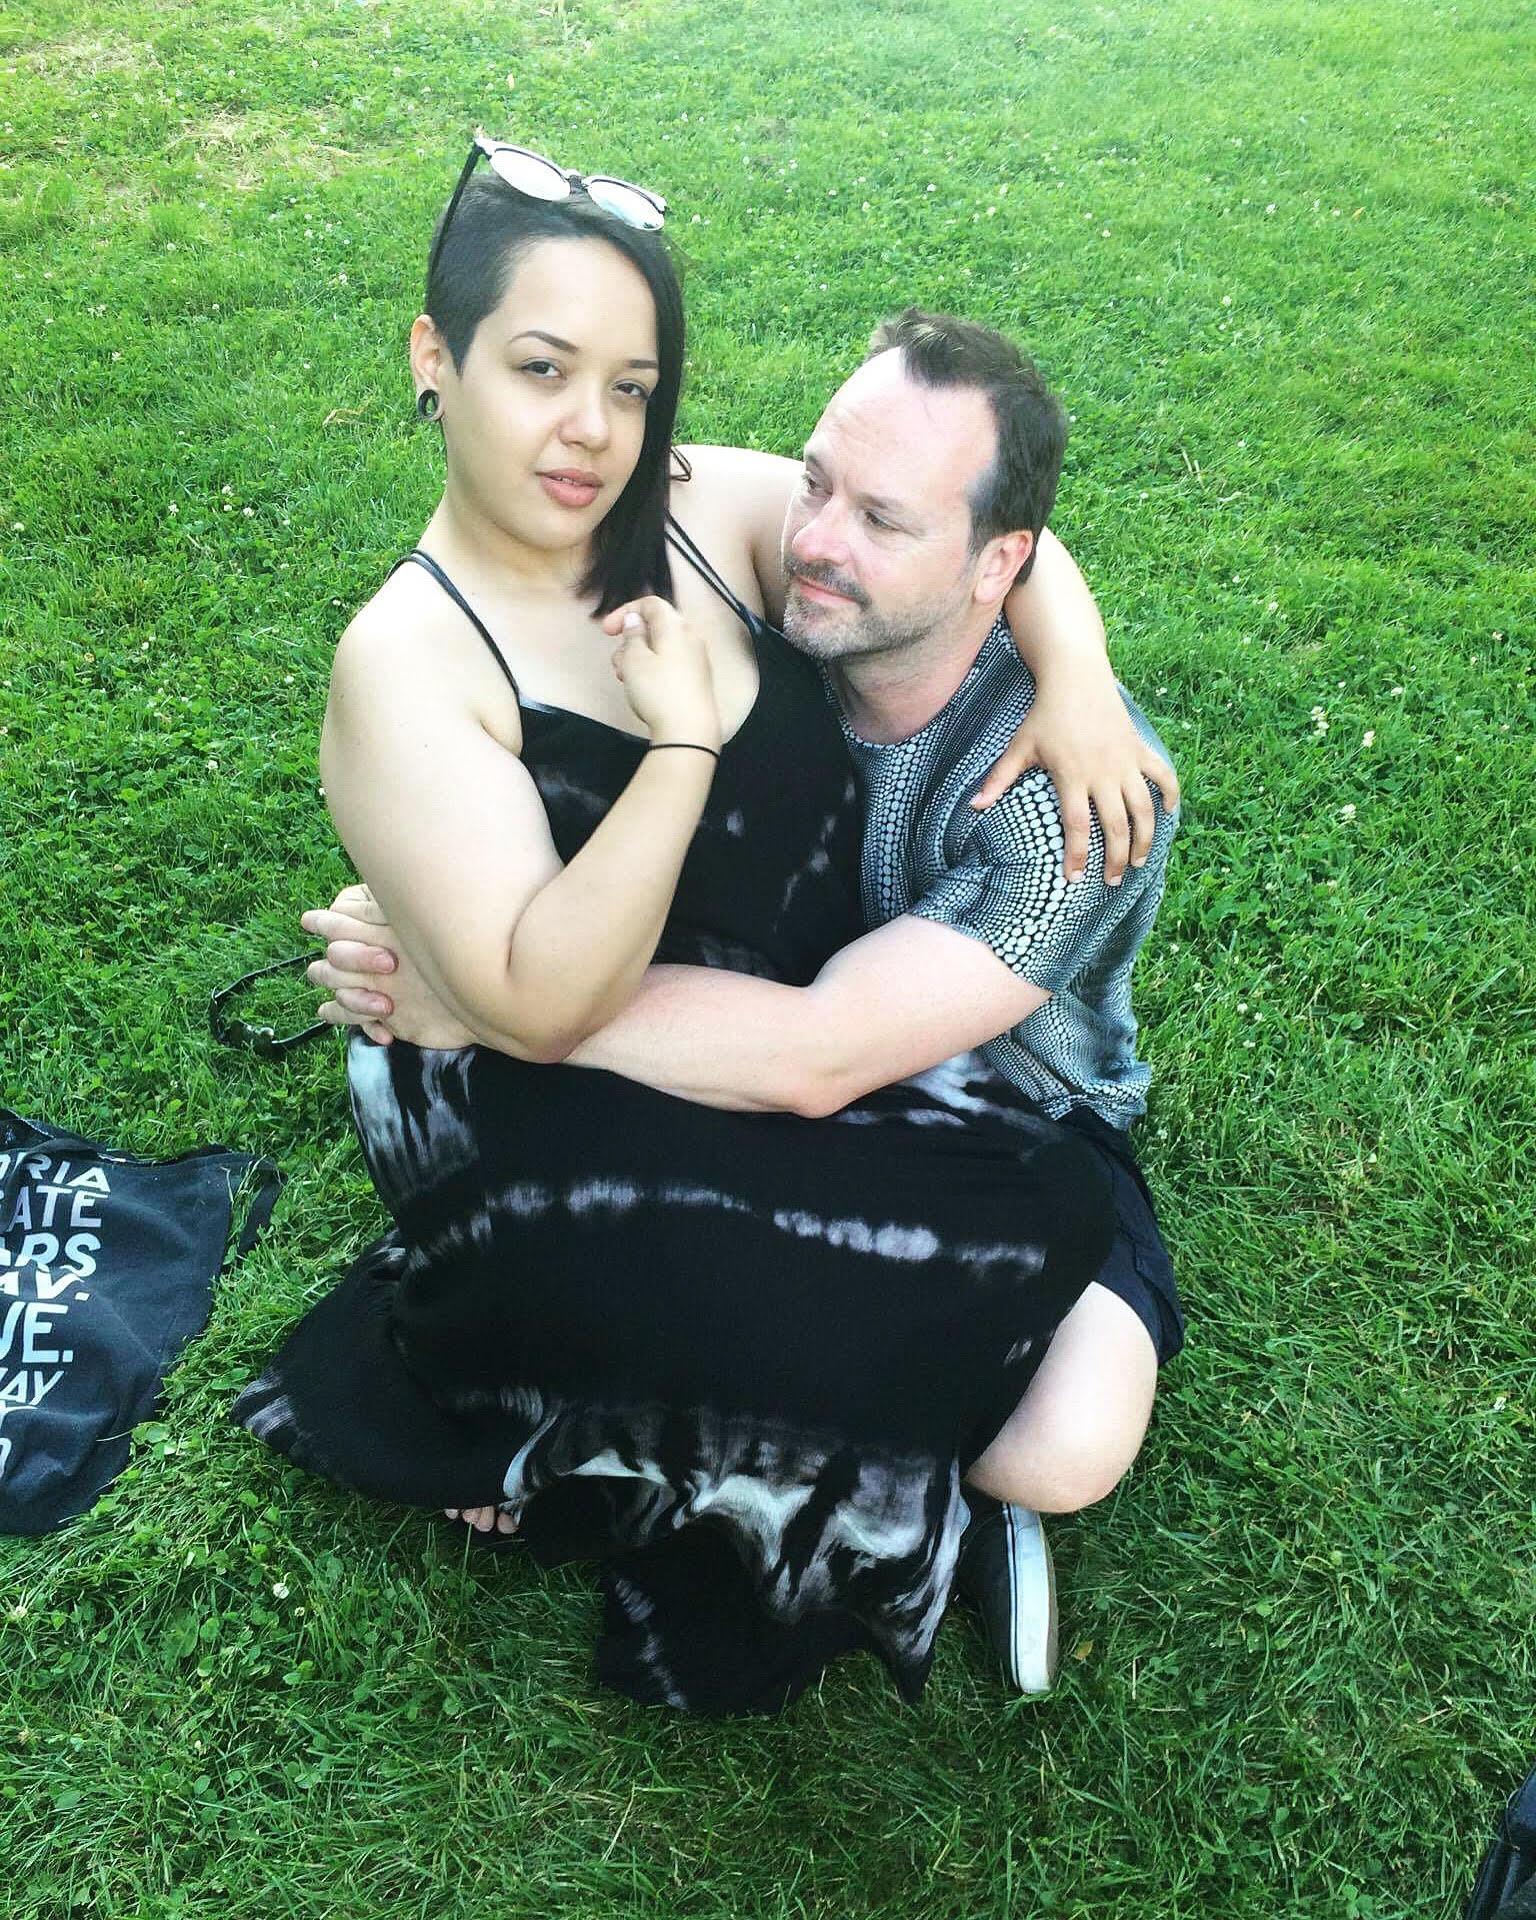 Less good natured okcupid dating